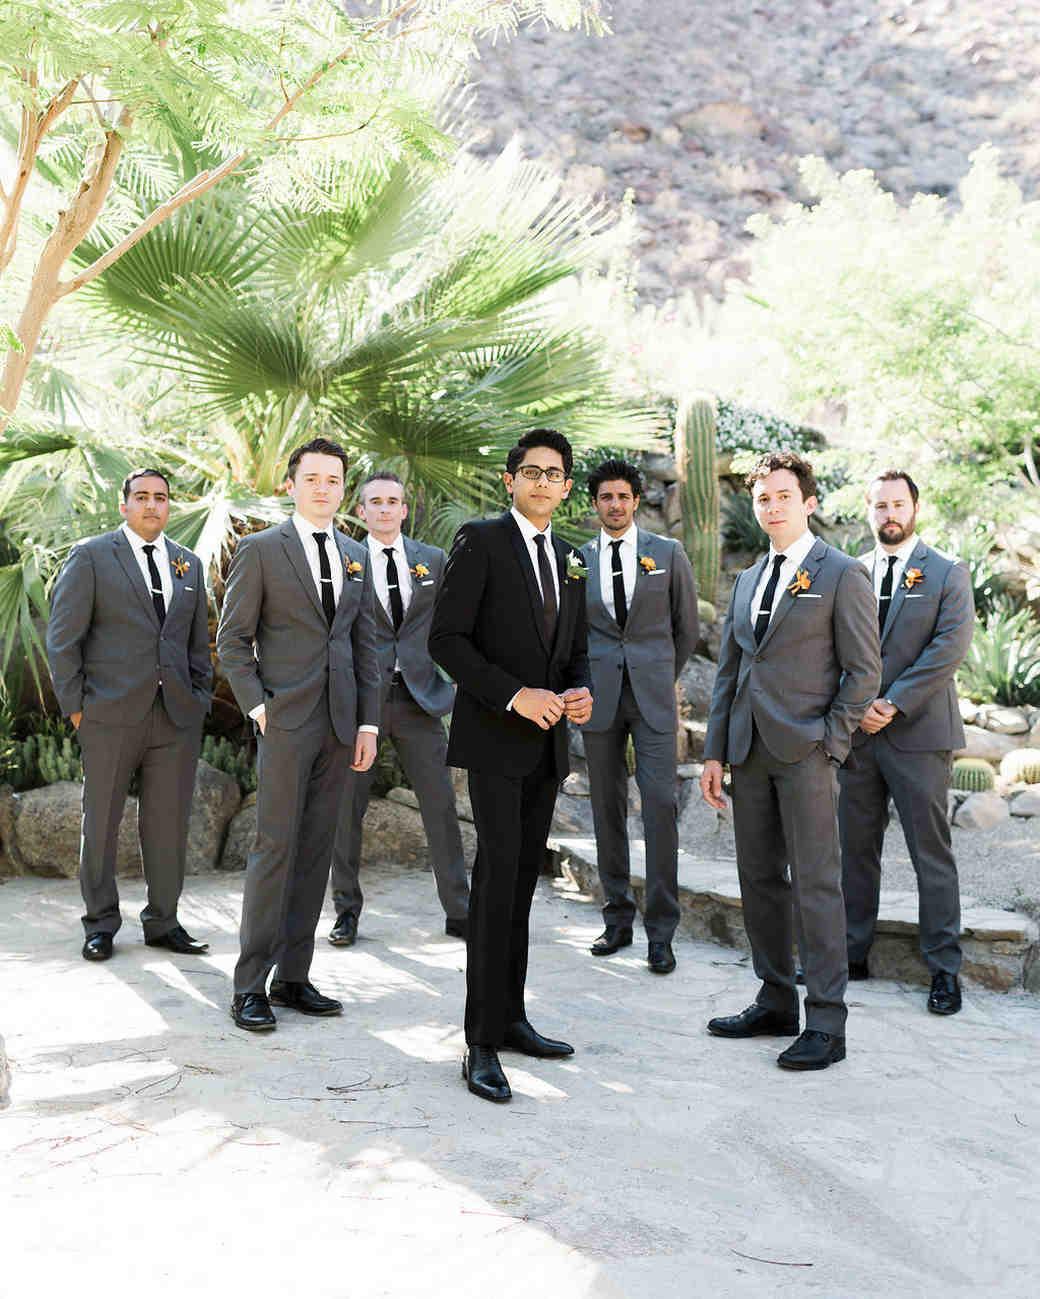 emily adhir wedding groomsmen